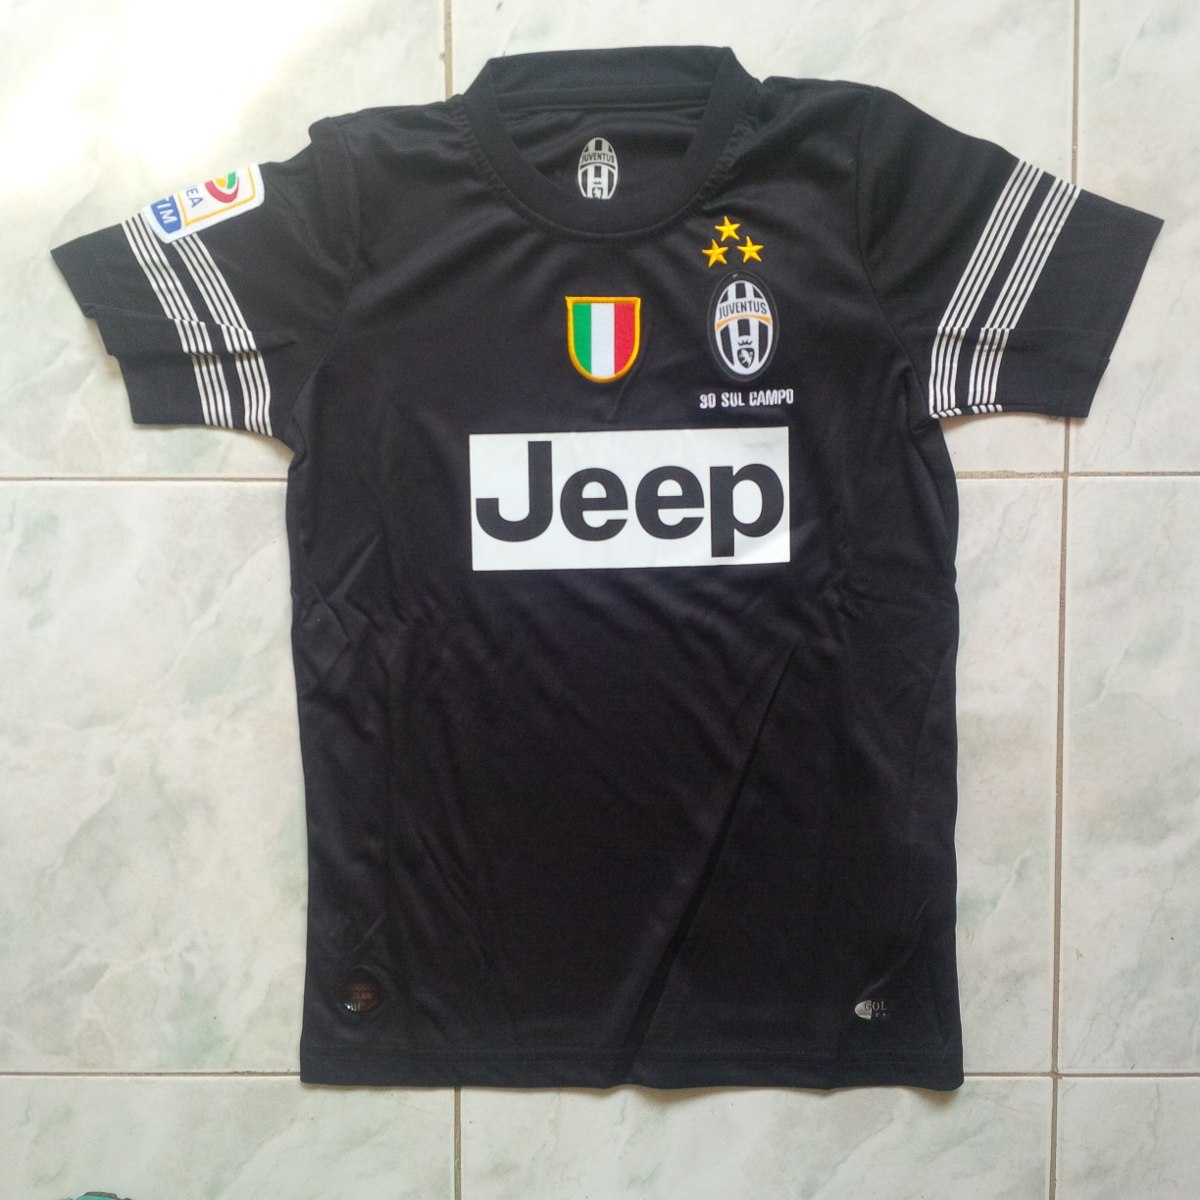 acfb4347a0d95 Uniforme Juventus Visitante 2012-2013 Solo Niños - Bs. 220